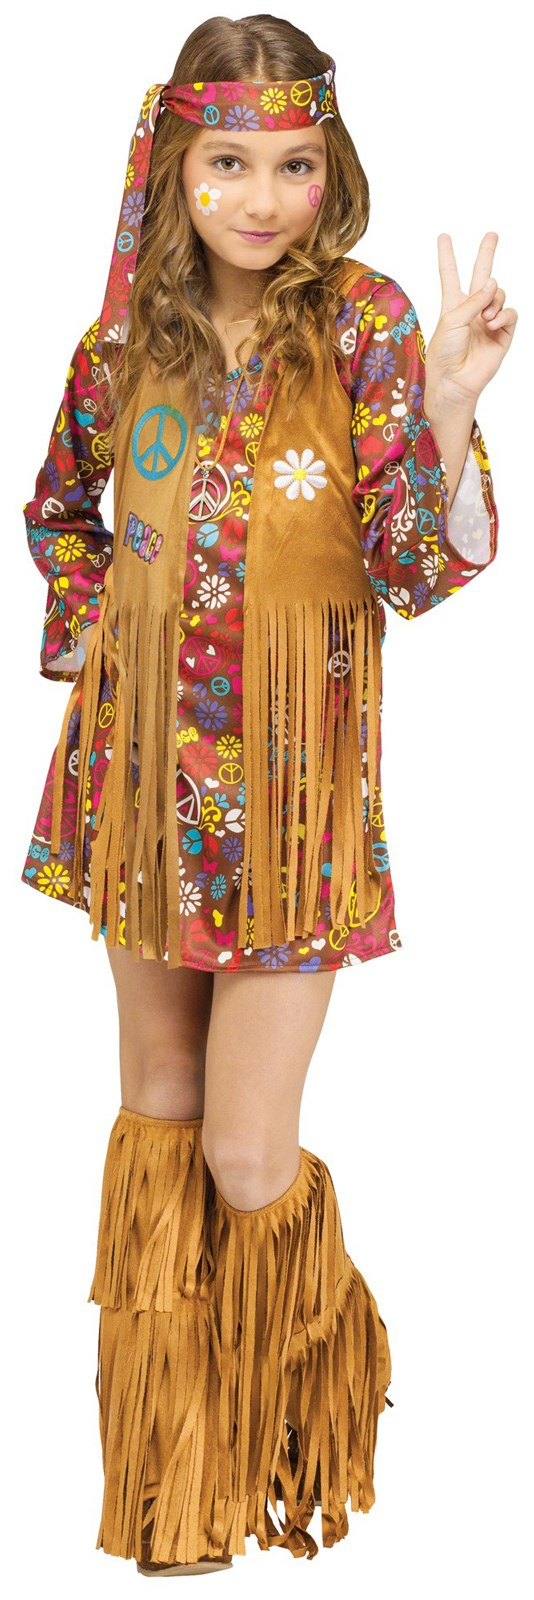 60s & 70s Hippies & Disco Costumes   BuyCostumes.com